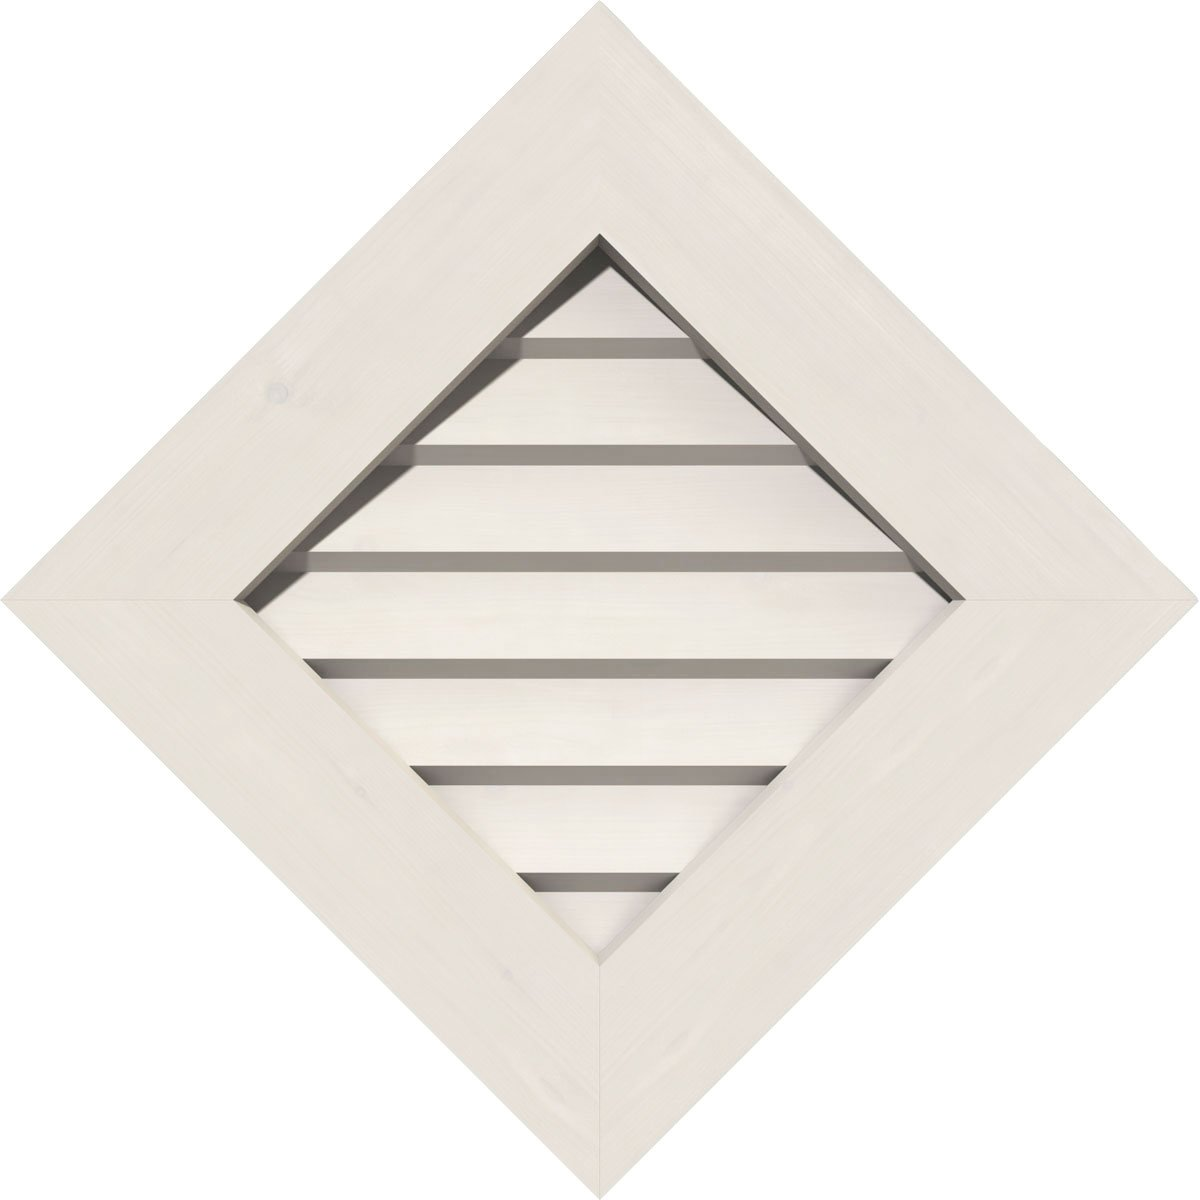 Functional Ekena Millwork GVPDI22X2201FUN 22 H Rough Opening 27 W x 27 H 22 W x 22 H Diamond x 27 H Size: Unfinished PVC Gable Vent w// 1 x 4 Flat Trim Frame